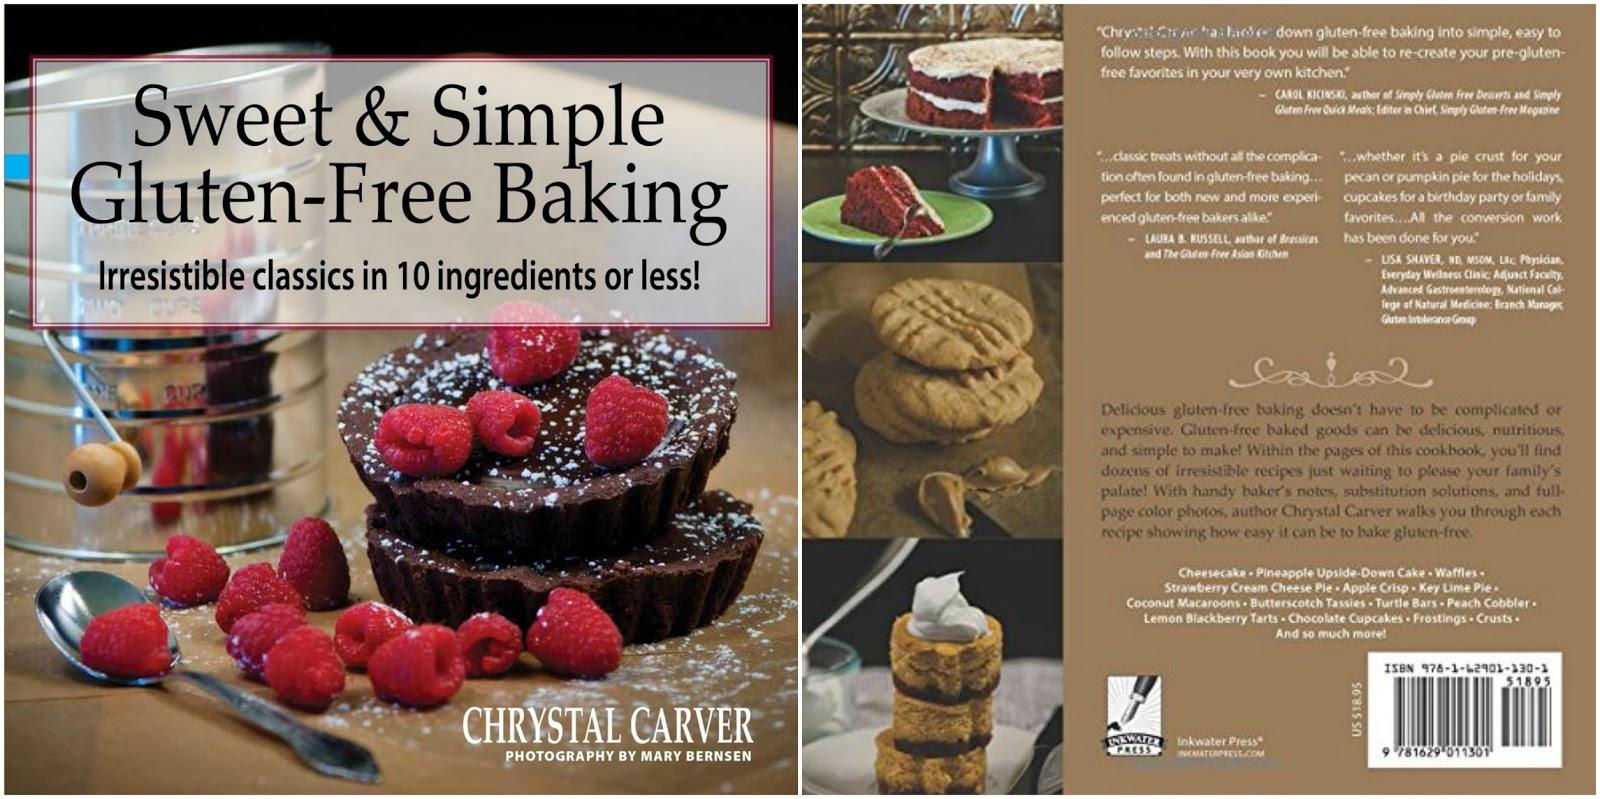 Converting cake recipe to gluten free